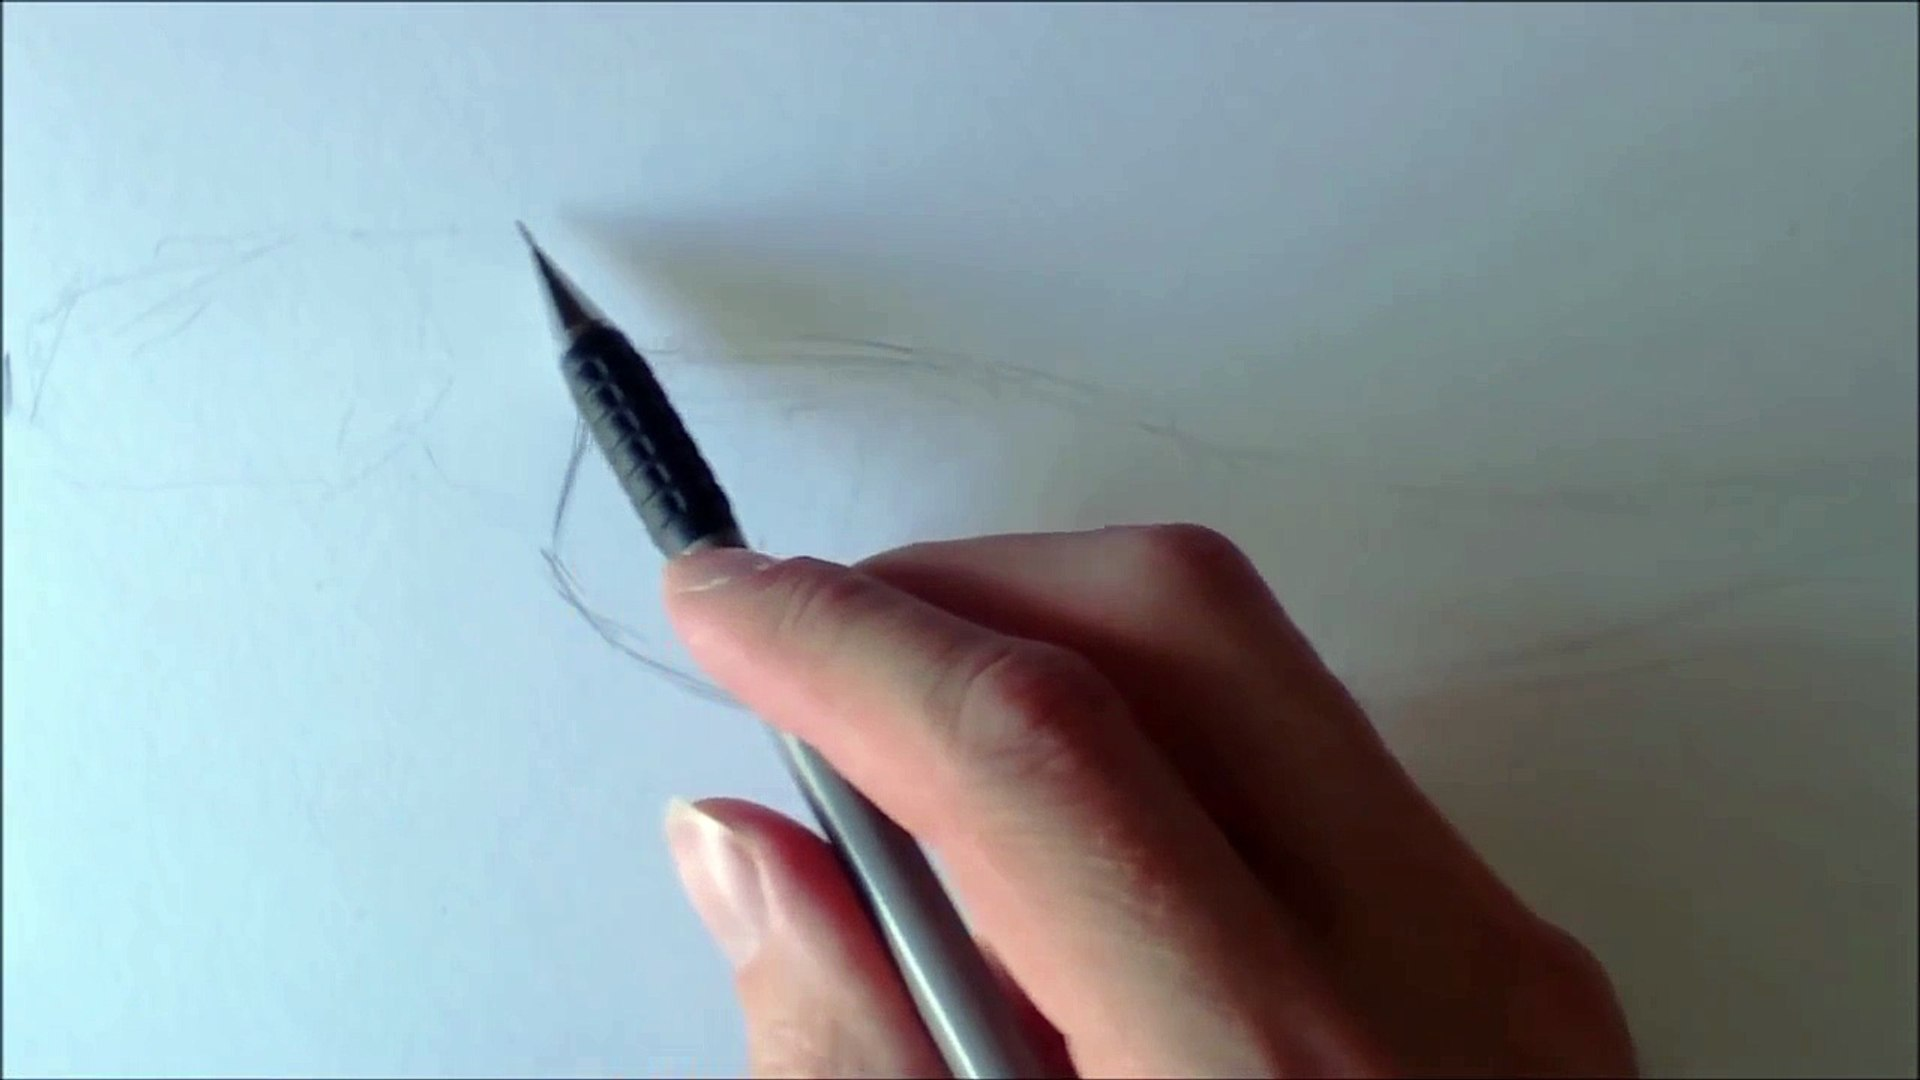 Tutorial How To Draw Tyrannosaurus Rex Rexy T rex from Jurassic Park